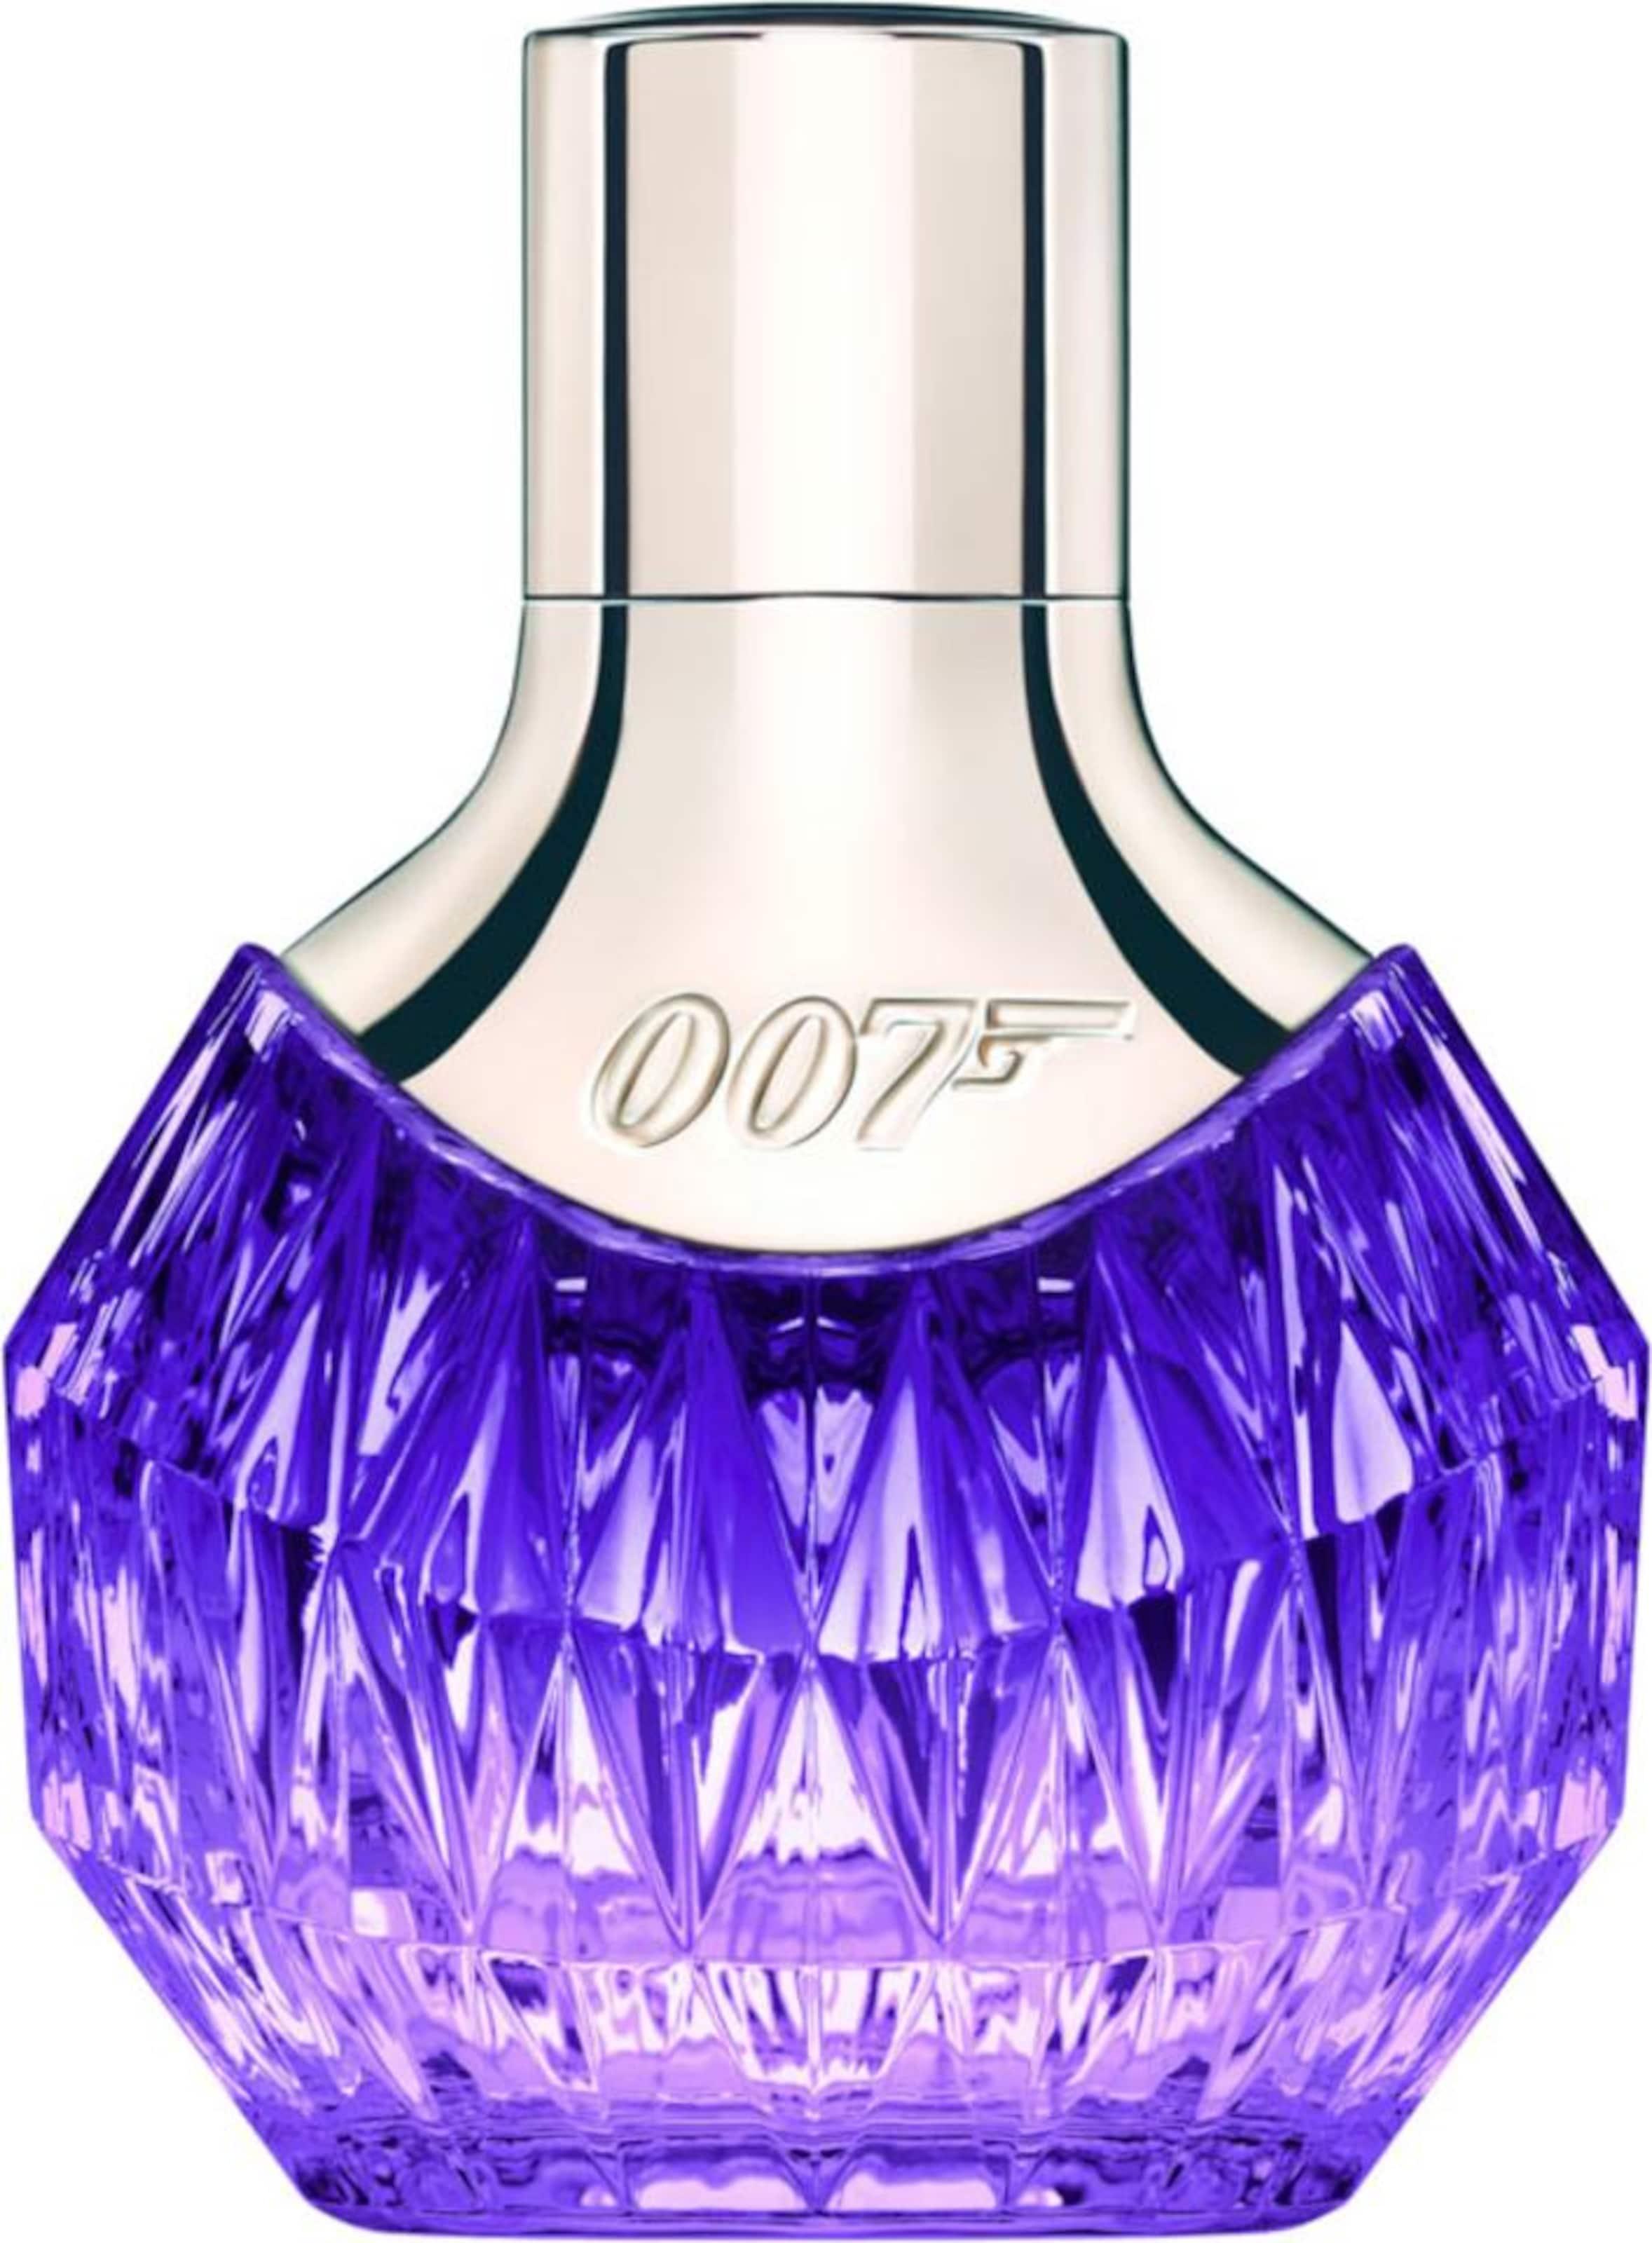 Parfum In 007 Bond DunkellilaSilber James k8NP0OXnw